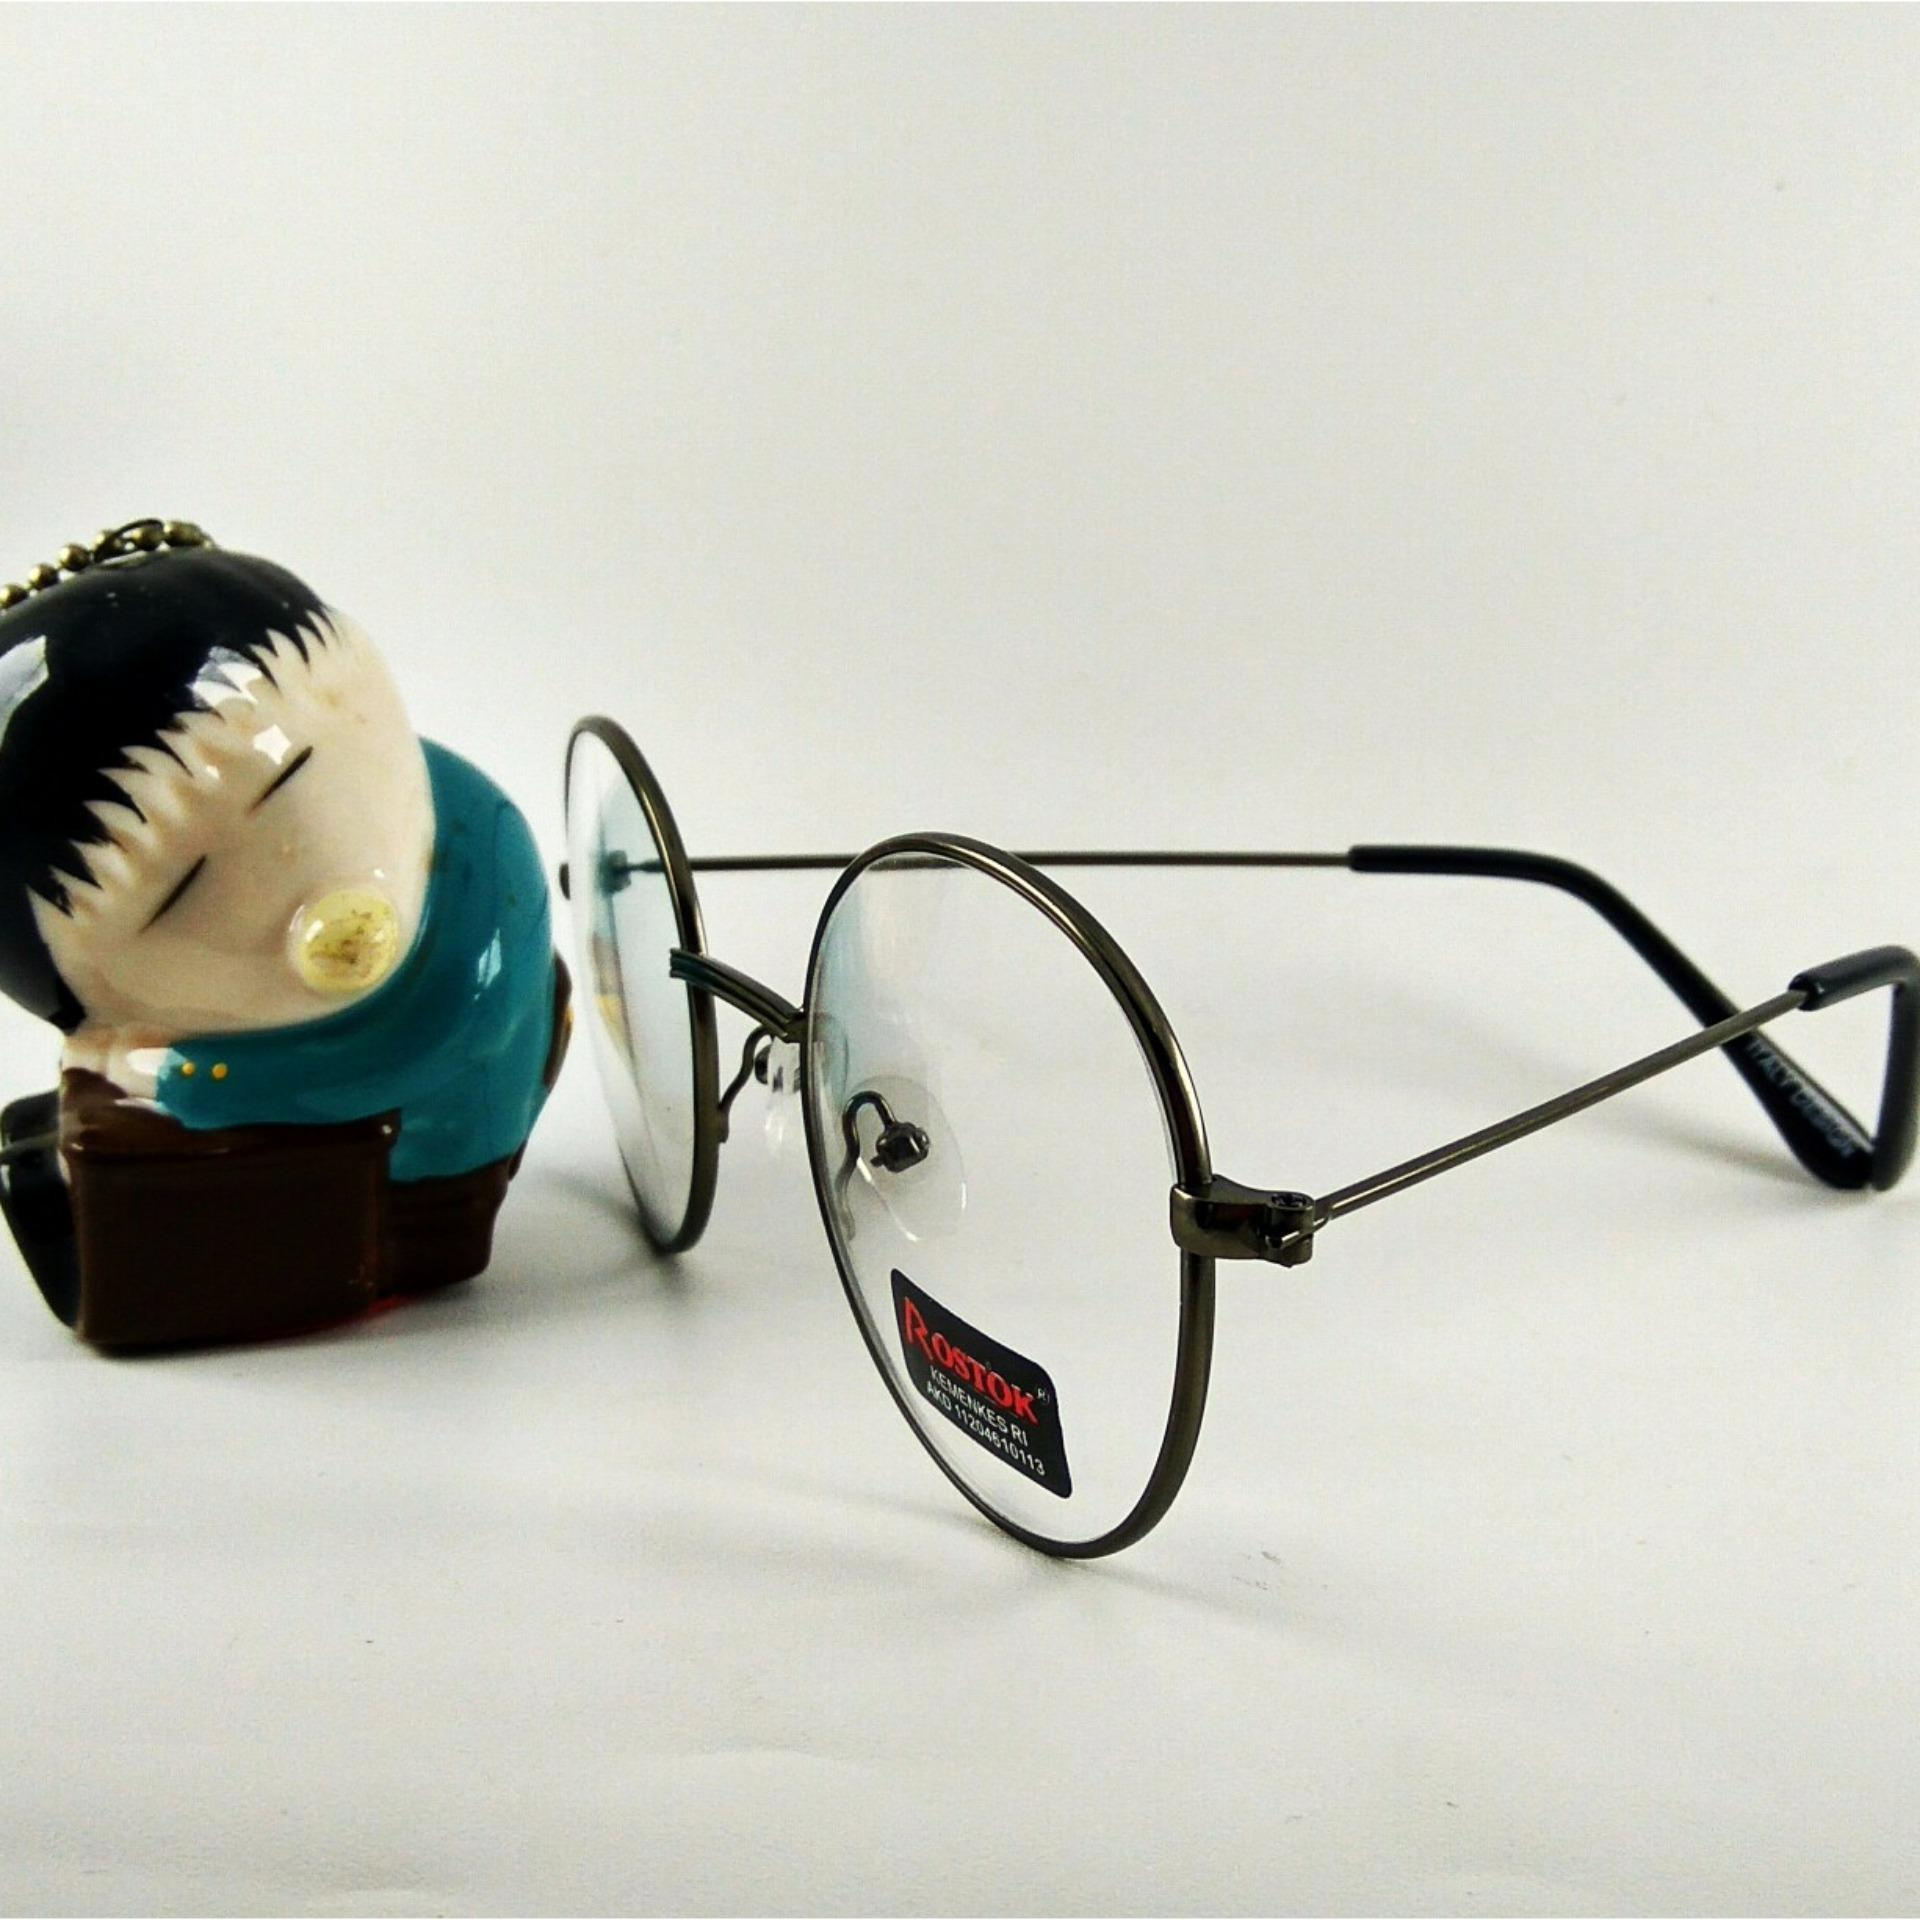 Promo Harga Hd Vision Wrap Arounds Kacamata Anti Silau Isi 2 Pcs Klip On Jual Sunglasses Unisex Termurah Night View